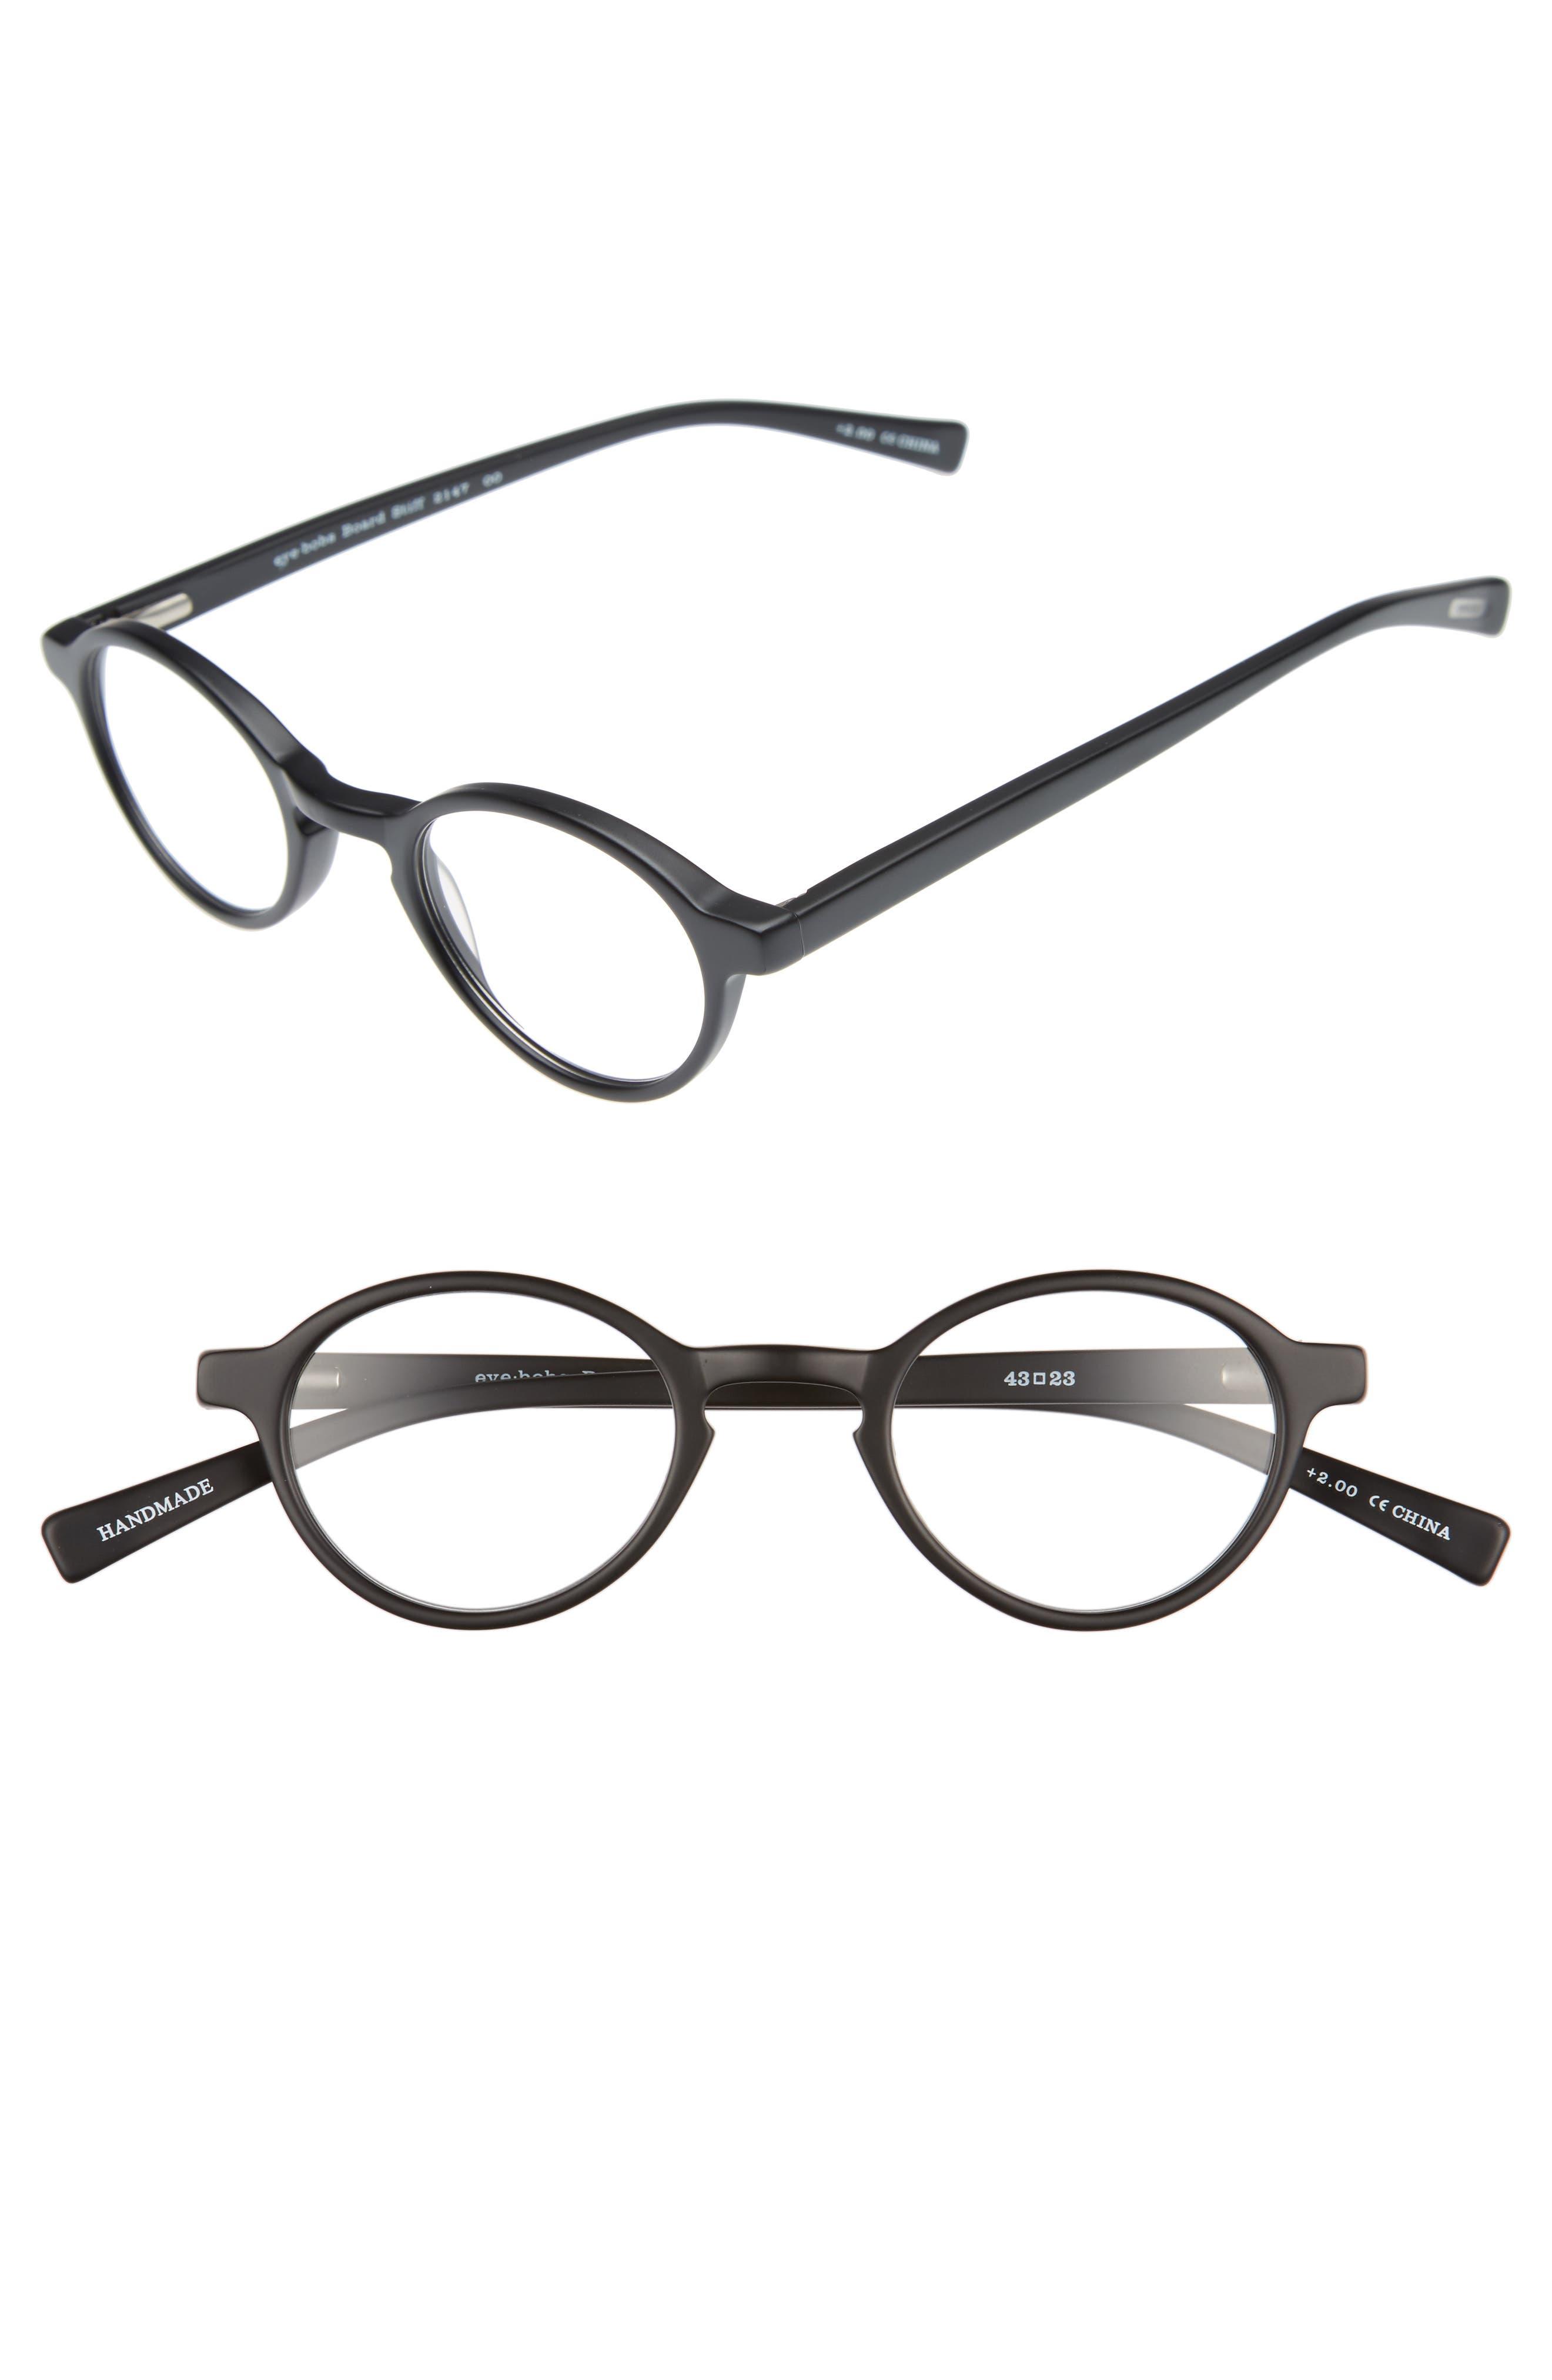 Board Stiff 43mm Reading Glasses,                             Main thumbnail 1, color,                             MATTE BLACK